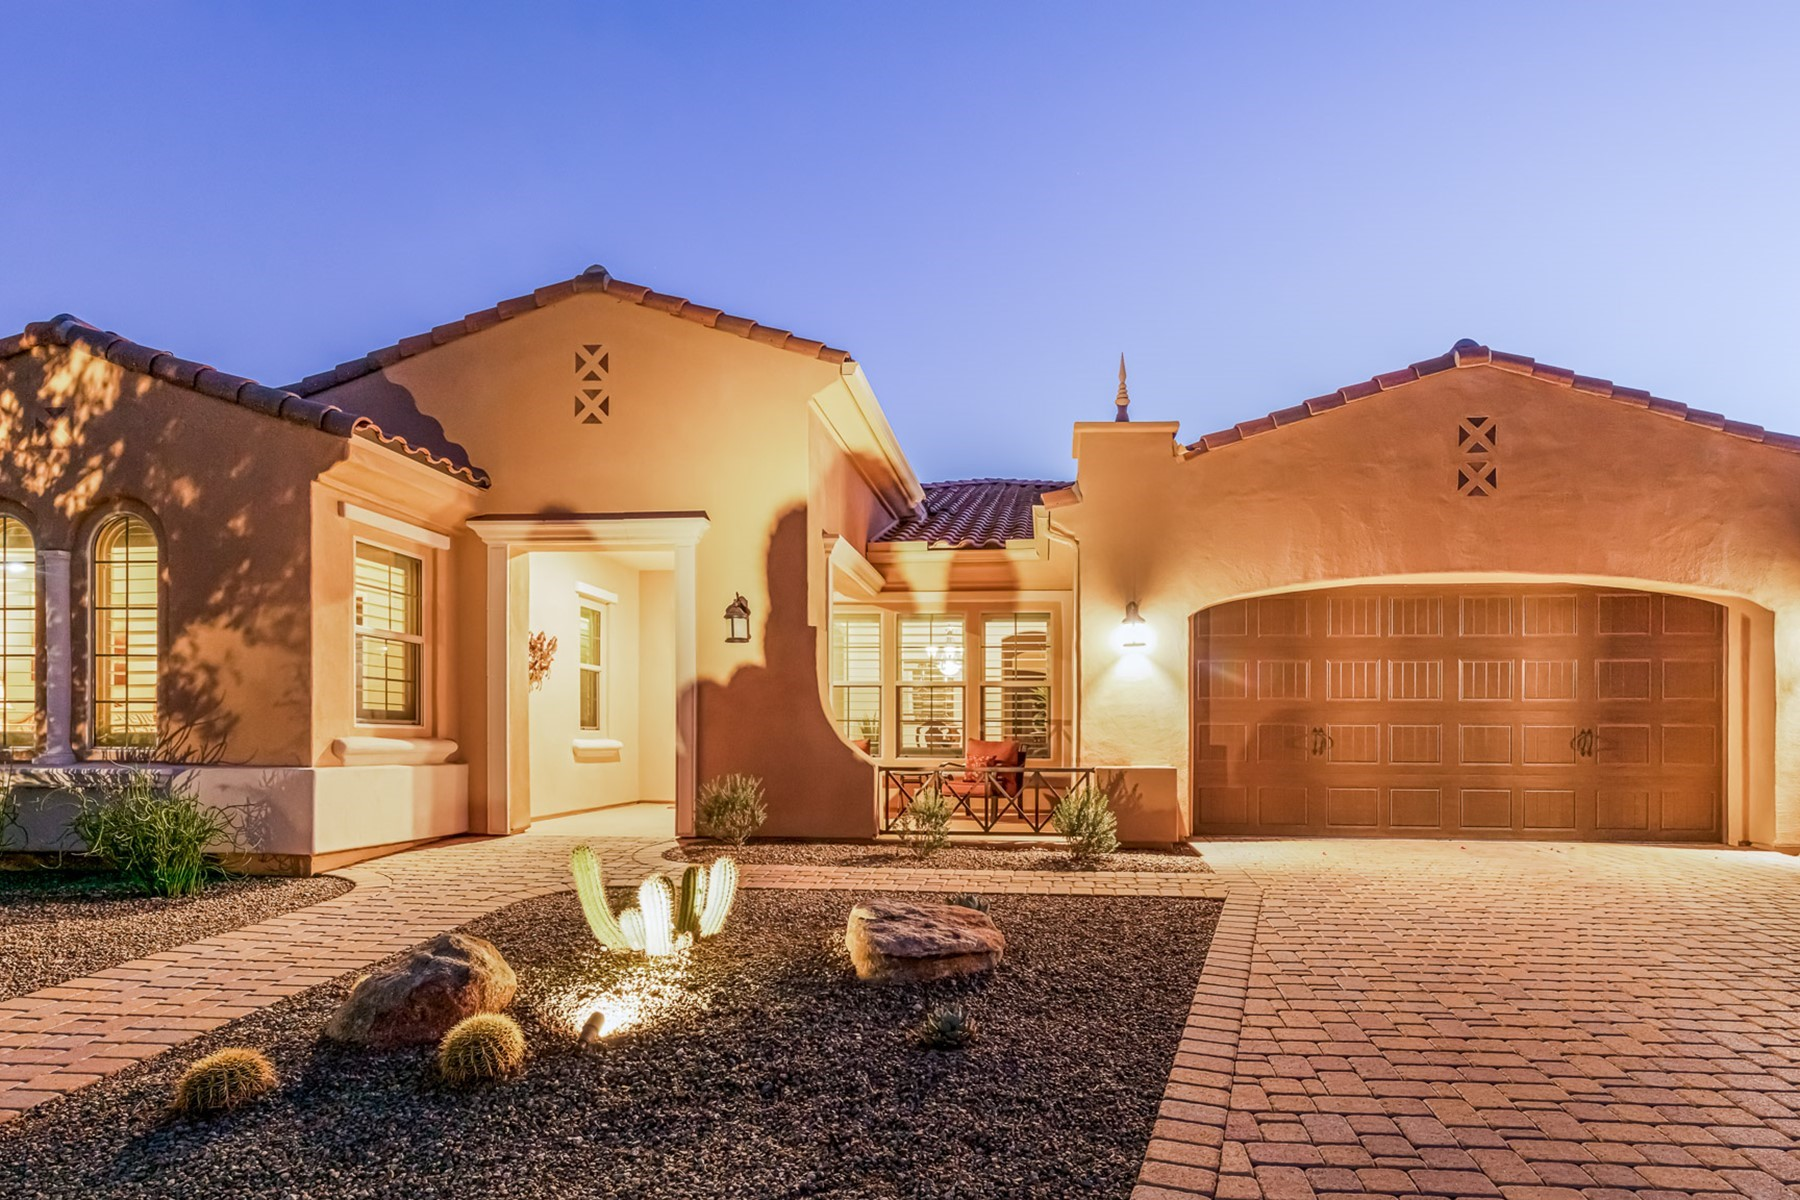 Single Family Homes for Sale at Victory at Verrado 4874 North Grandview Drive Buckeye, Arizona 85396 United States